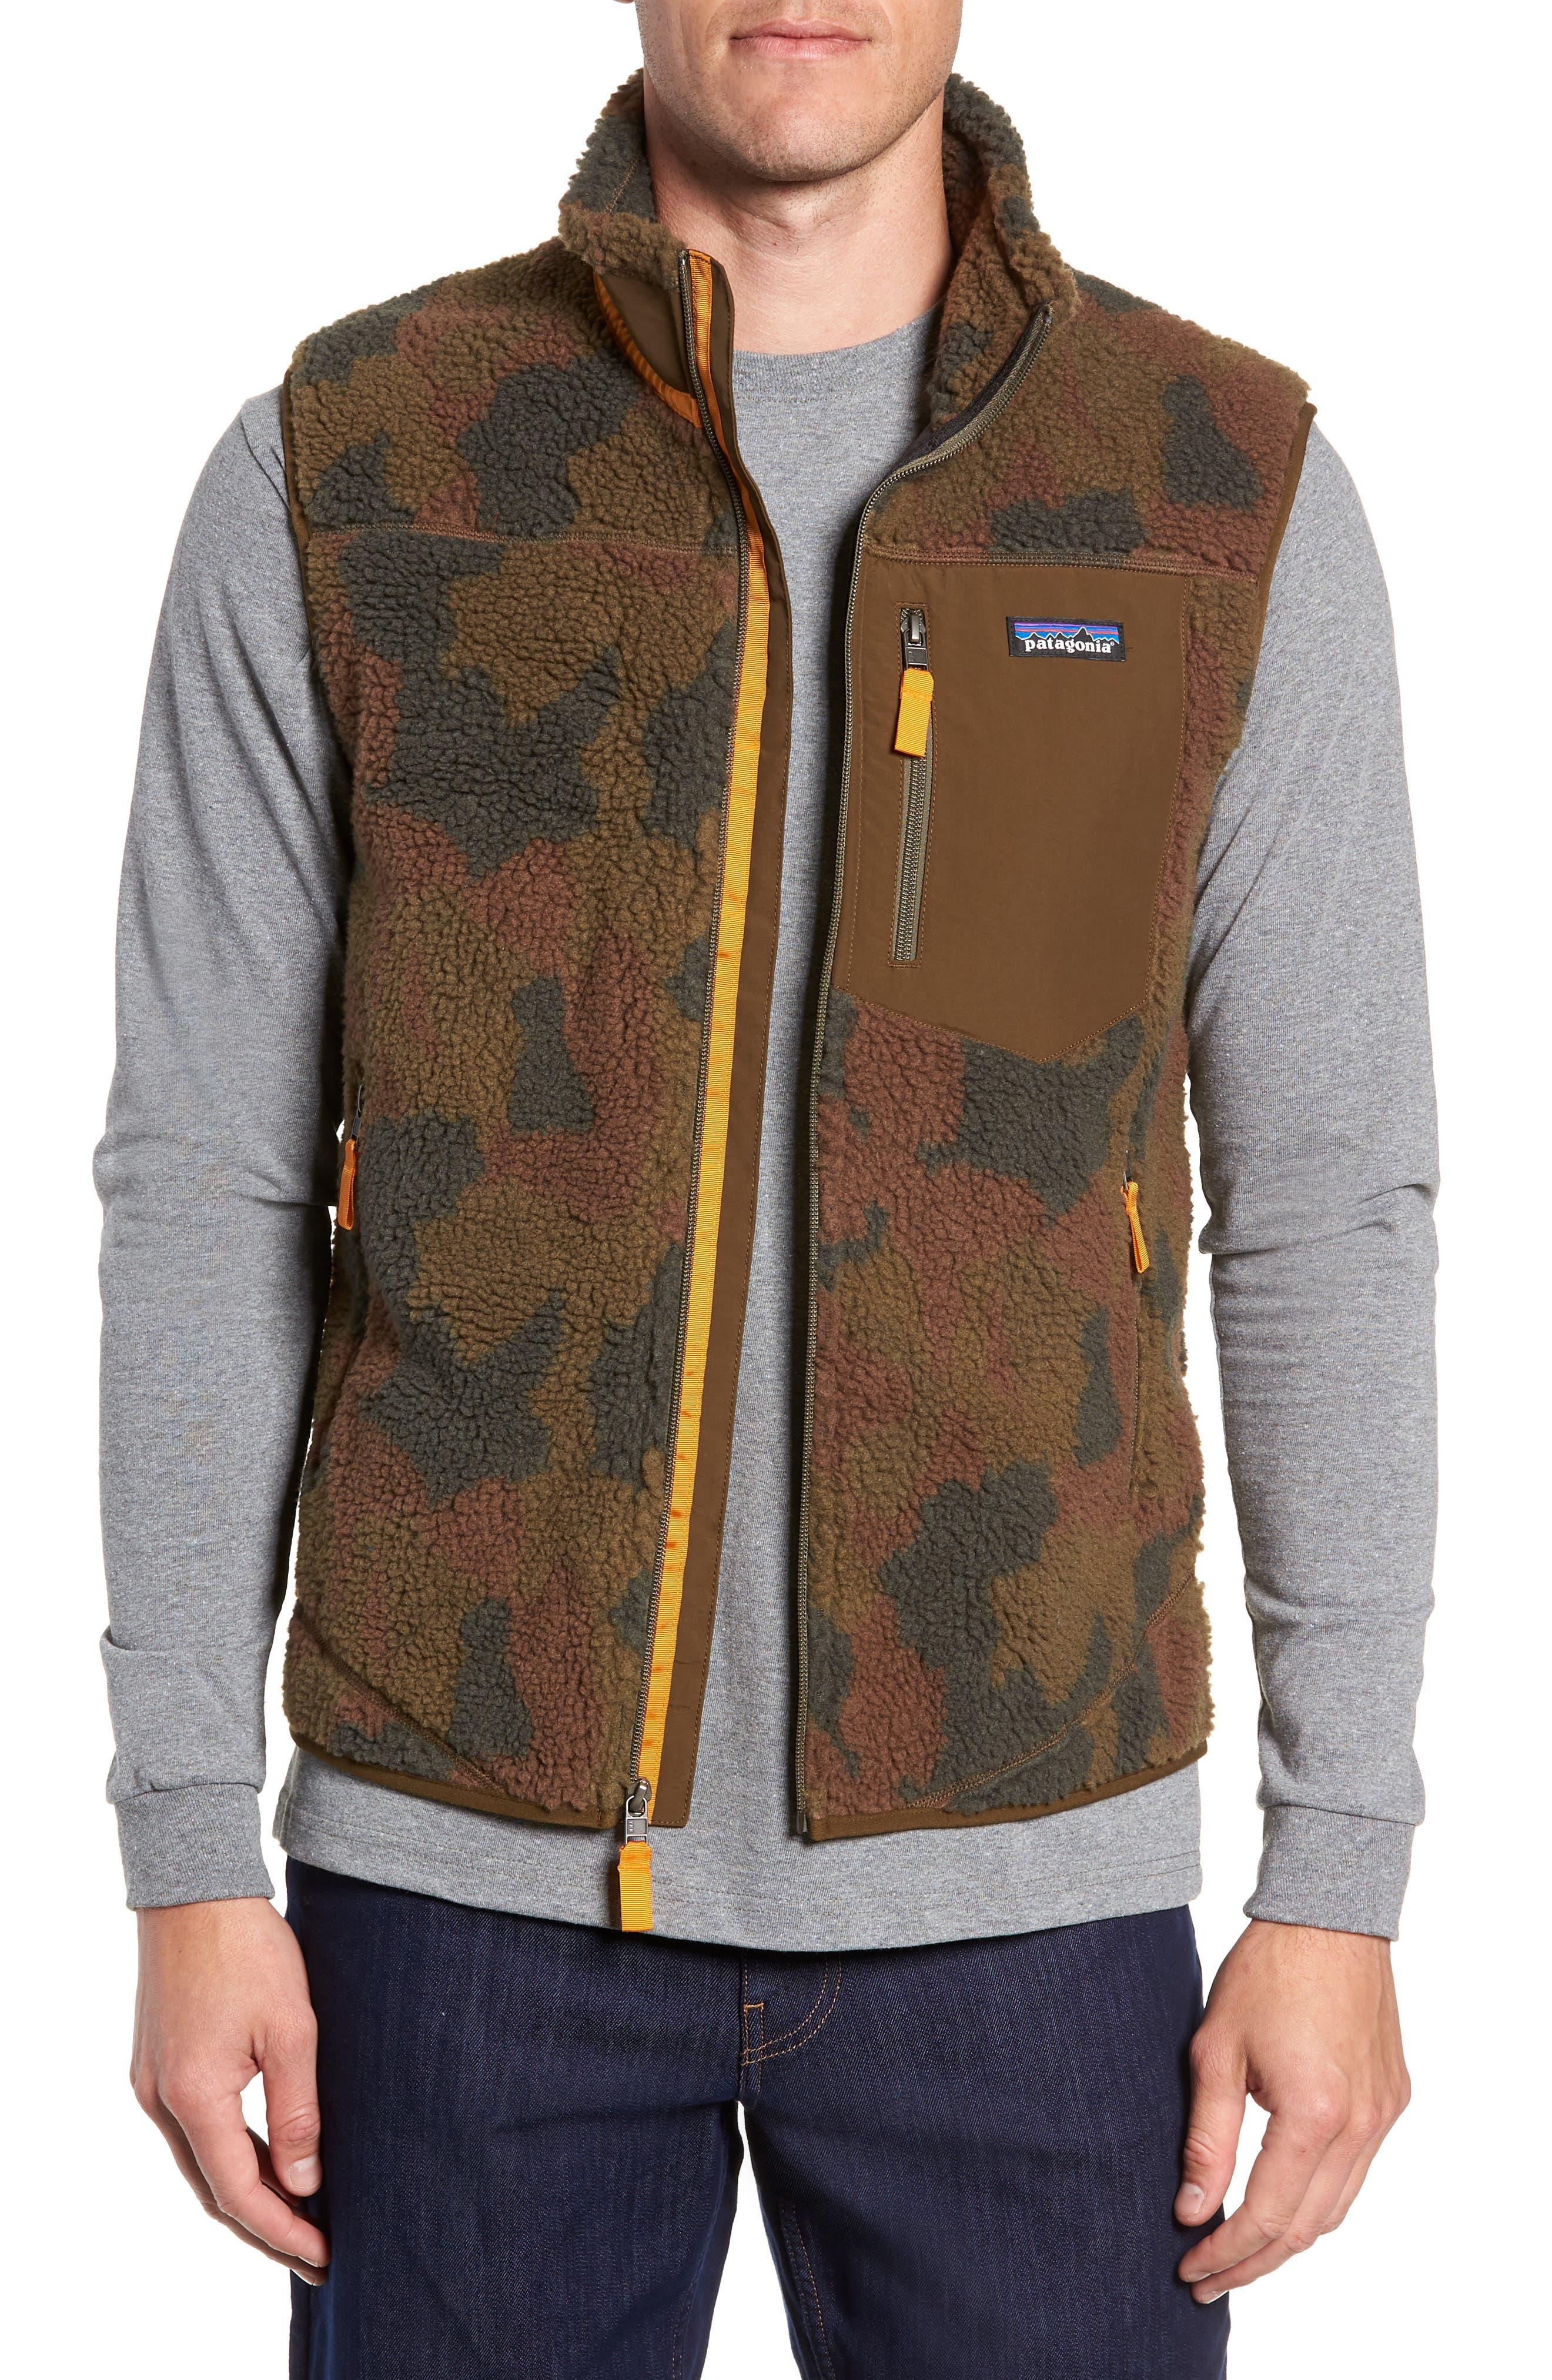 Classic Retro-X<sup>®</sup> Windproof Vest,                             Main thumbnail 1, color,                             BUNKER CAMO CARGO GREEN